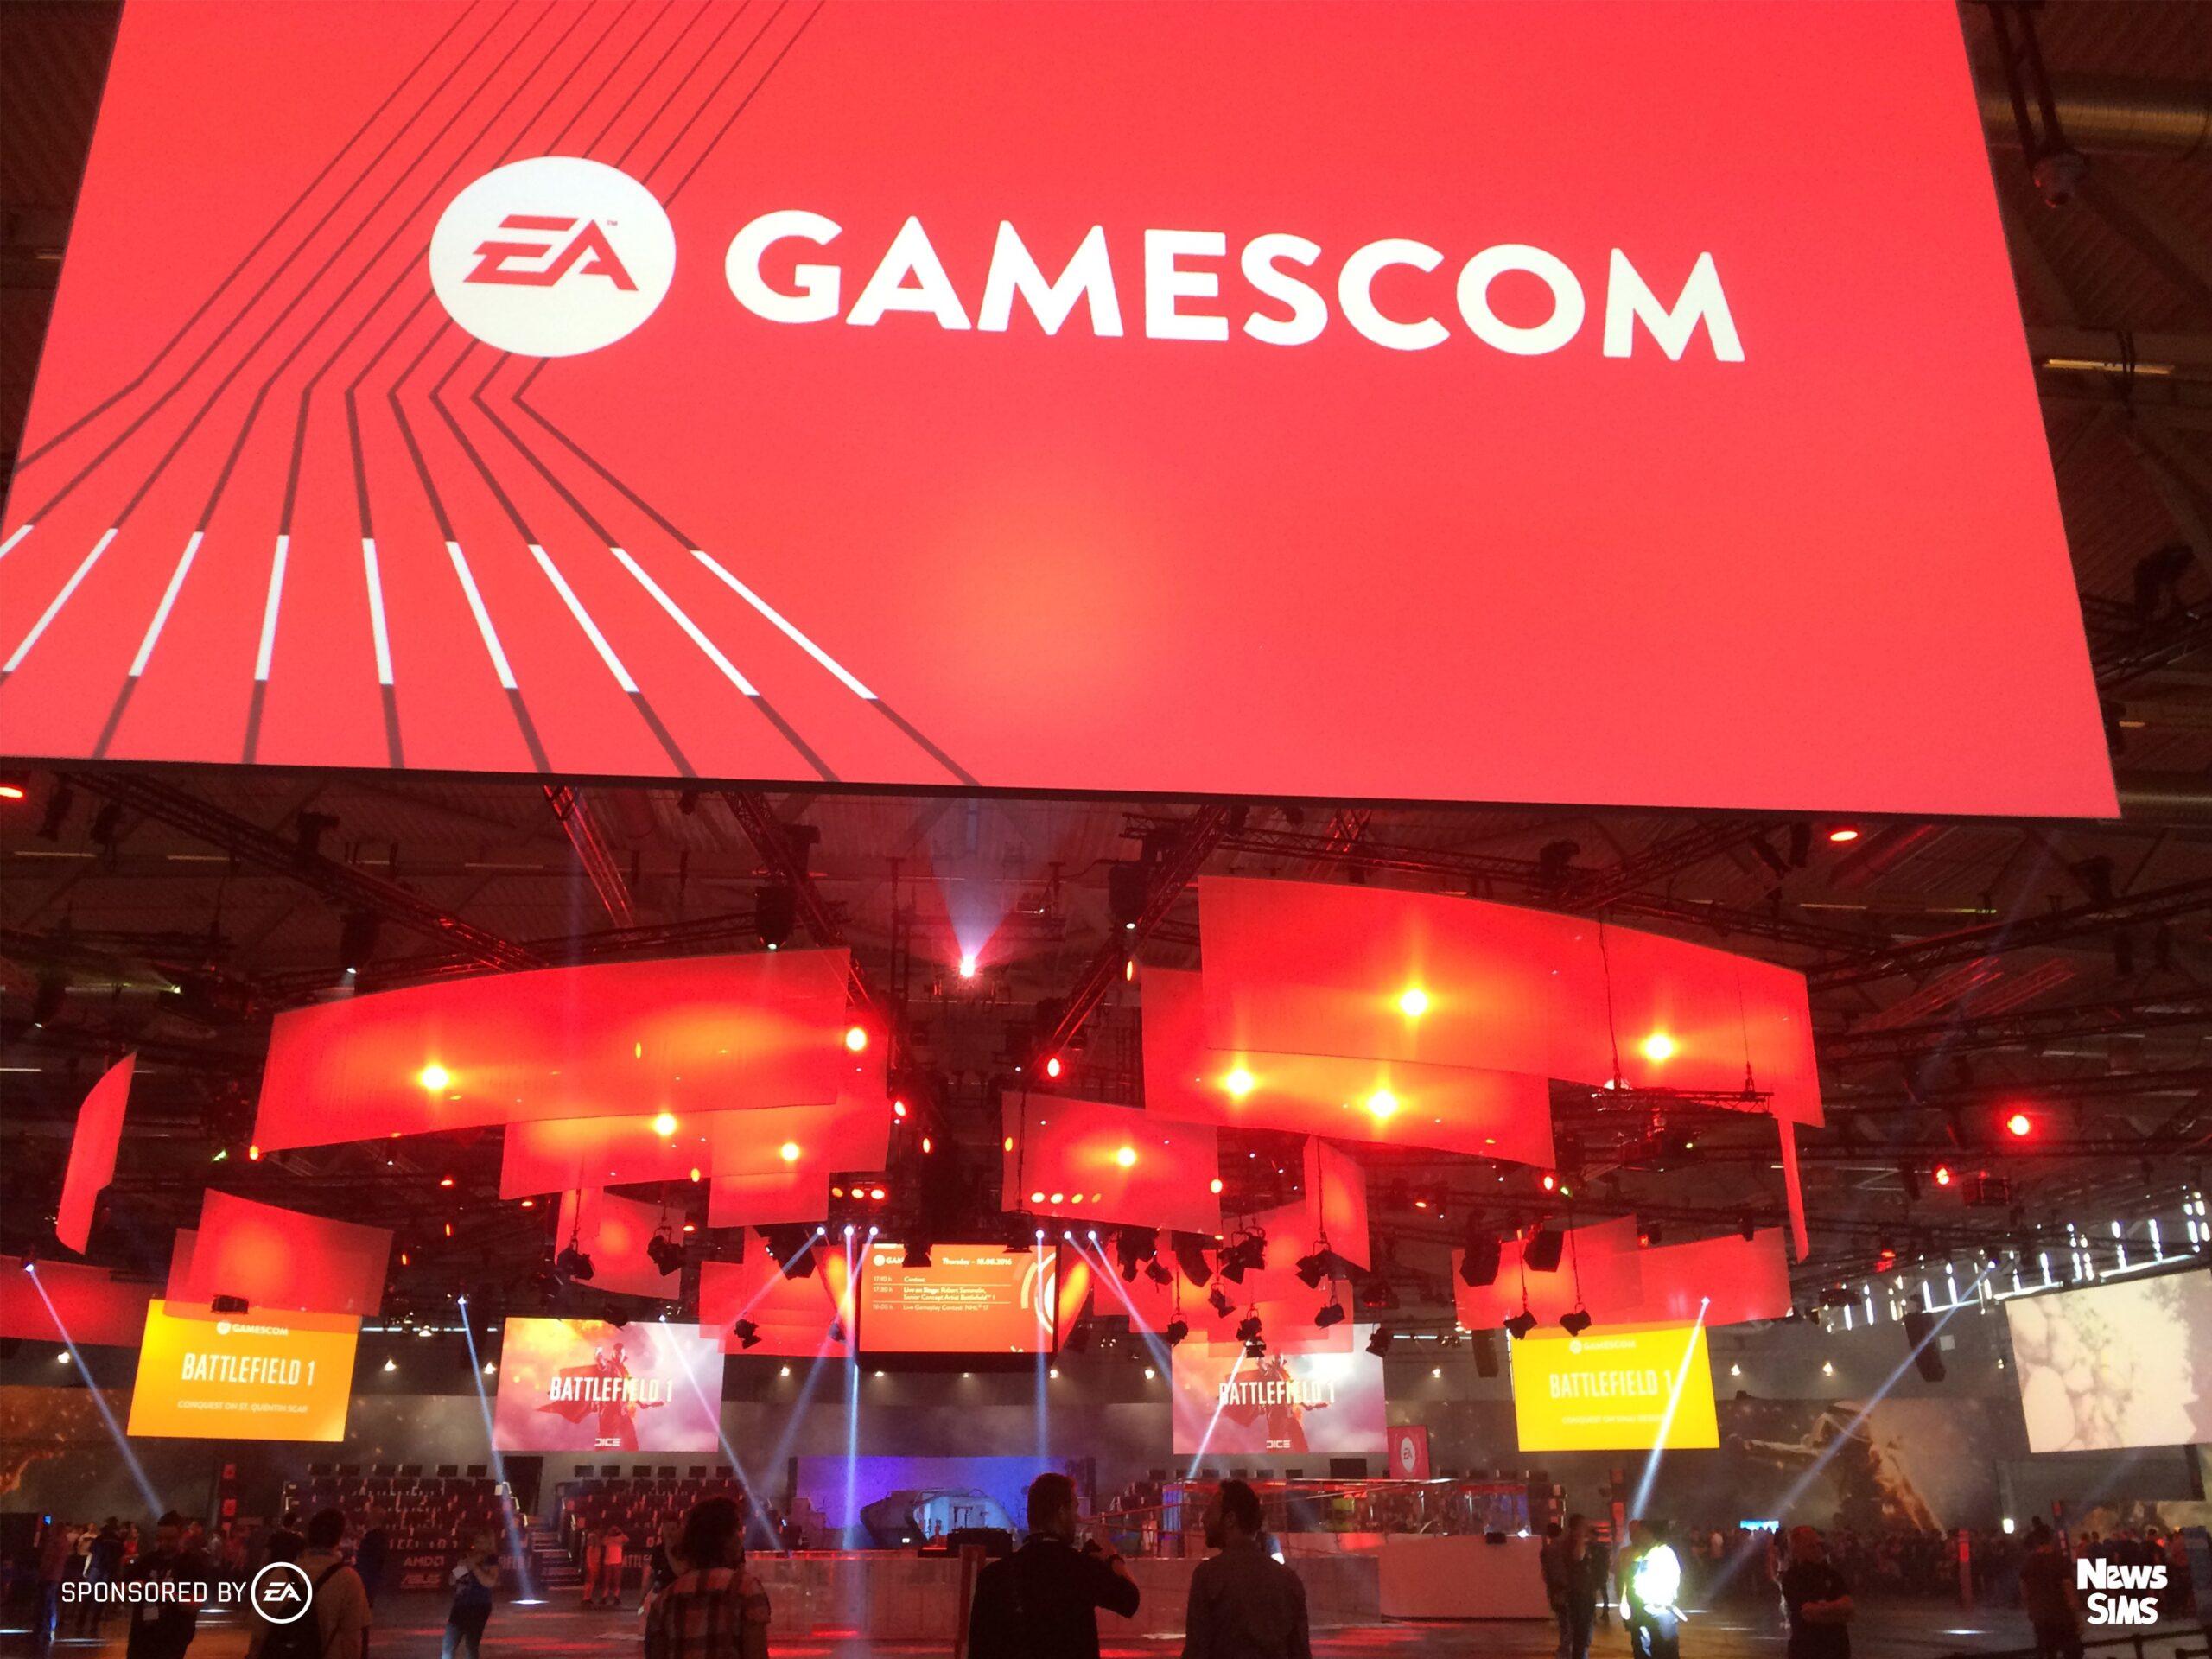 Le News Sims part à la Gamescom